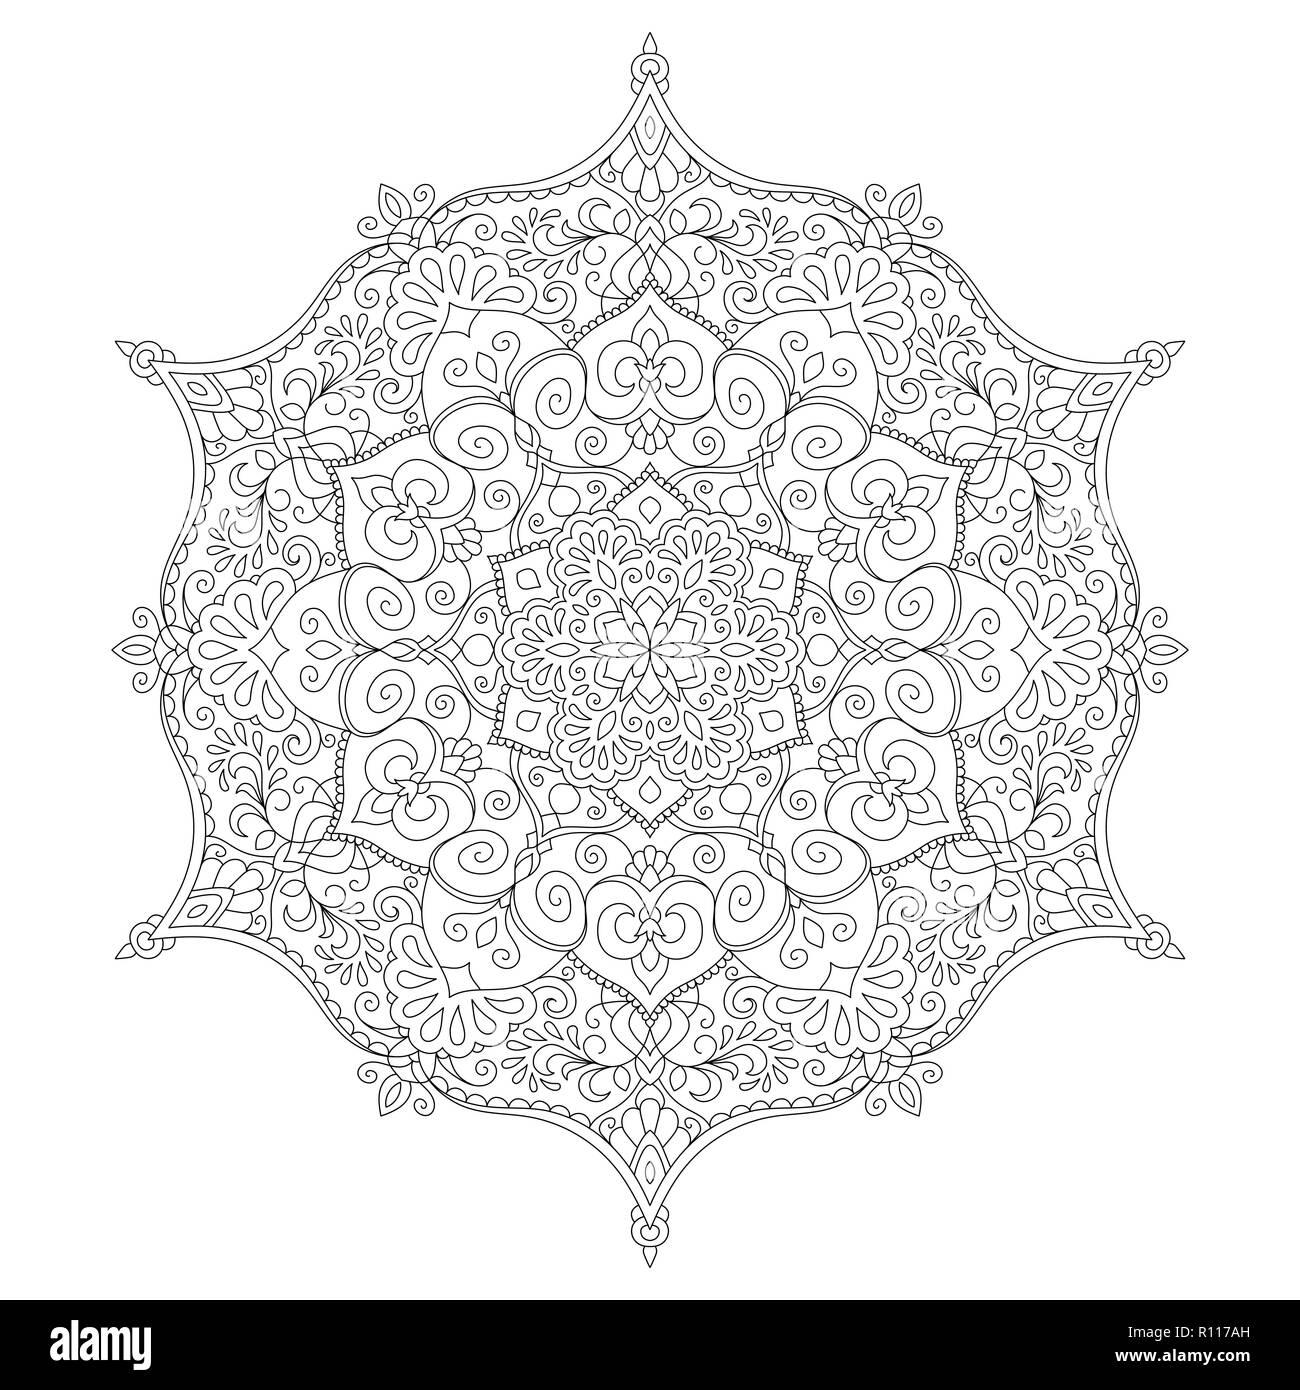 - Mandala Coloring Page Flower Design Element For Adult Color Book